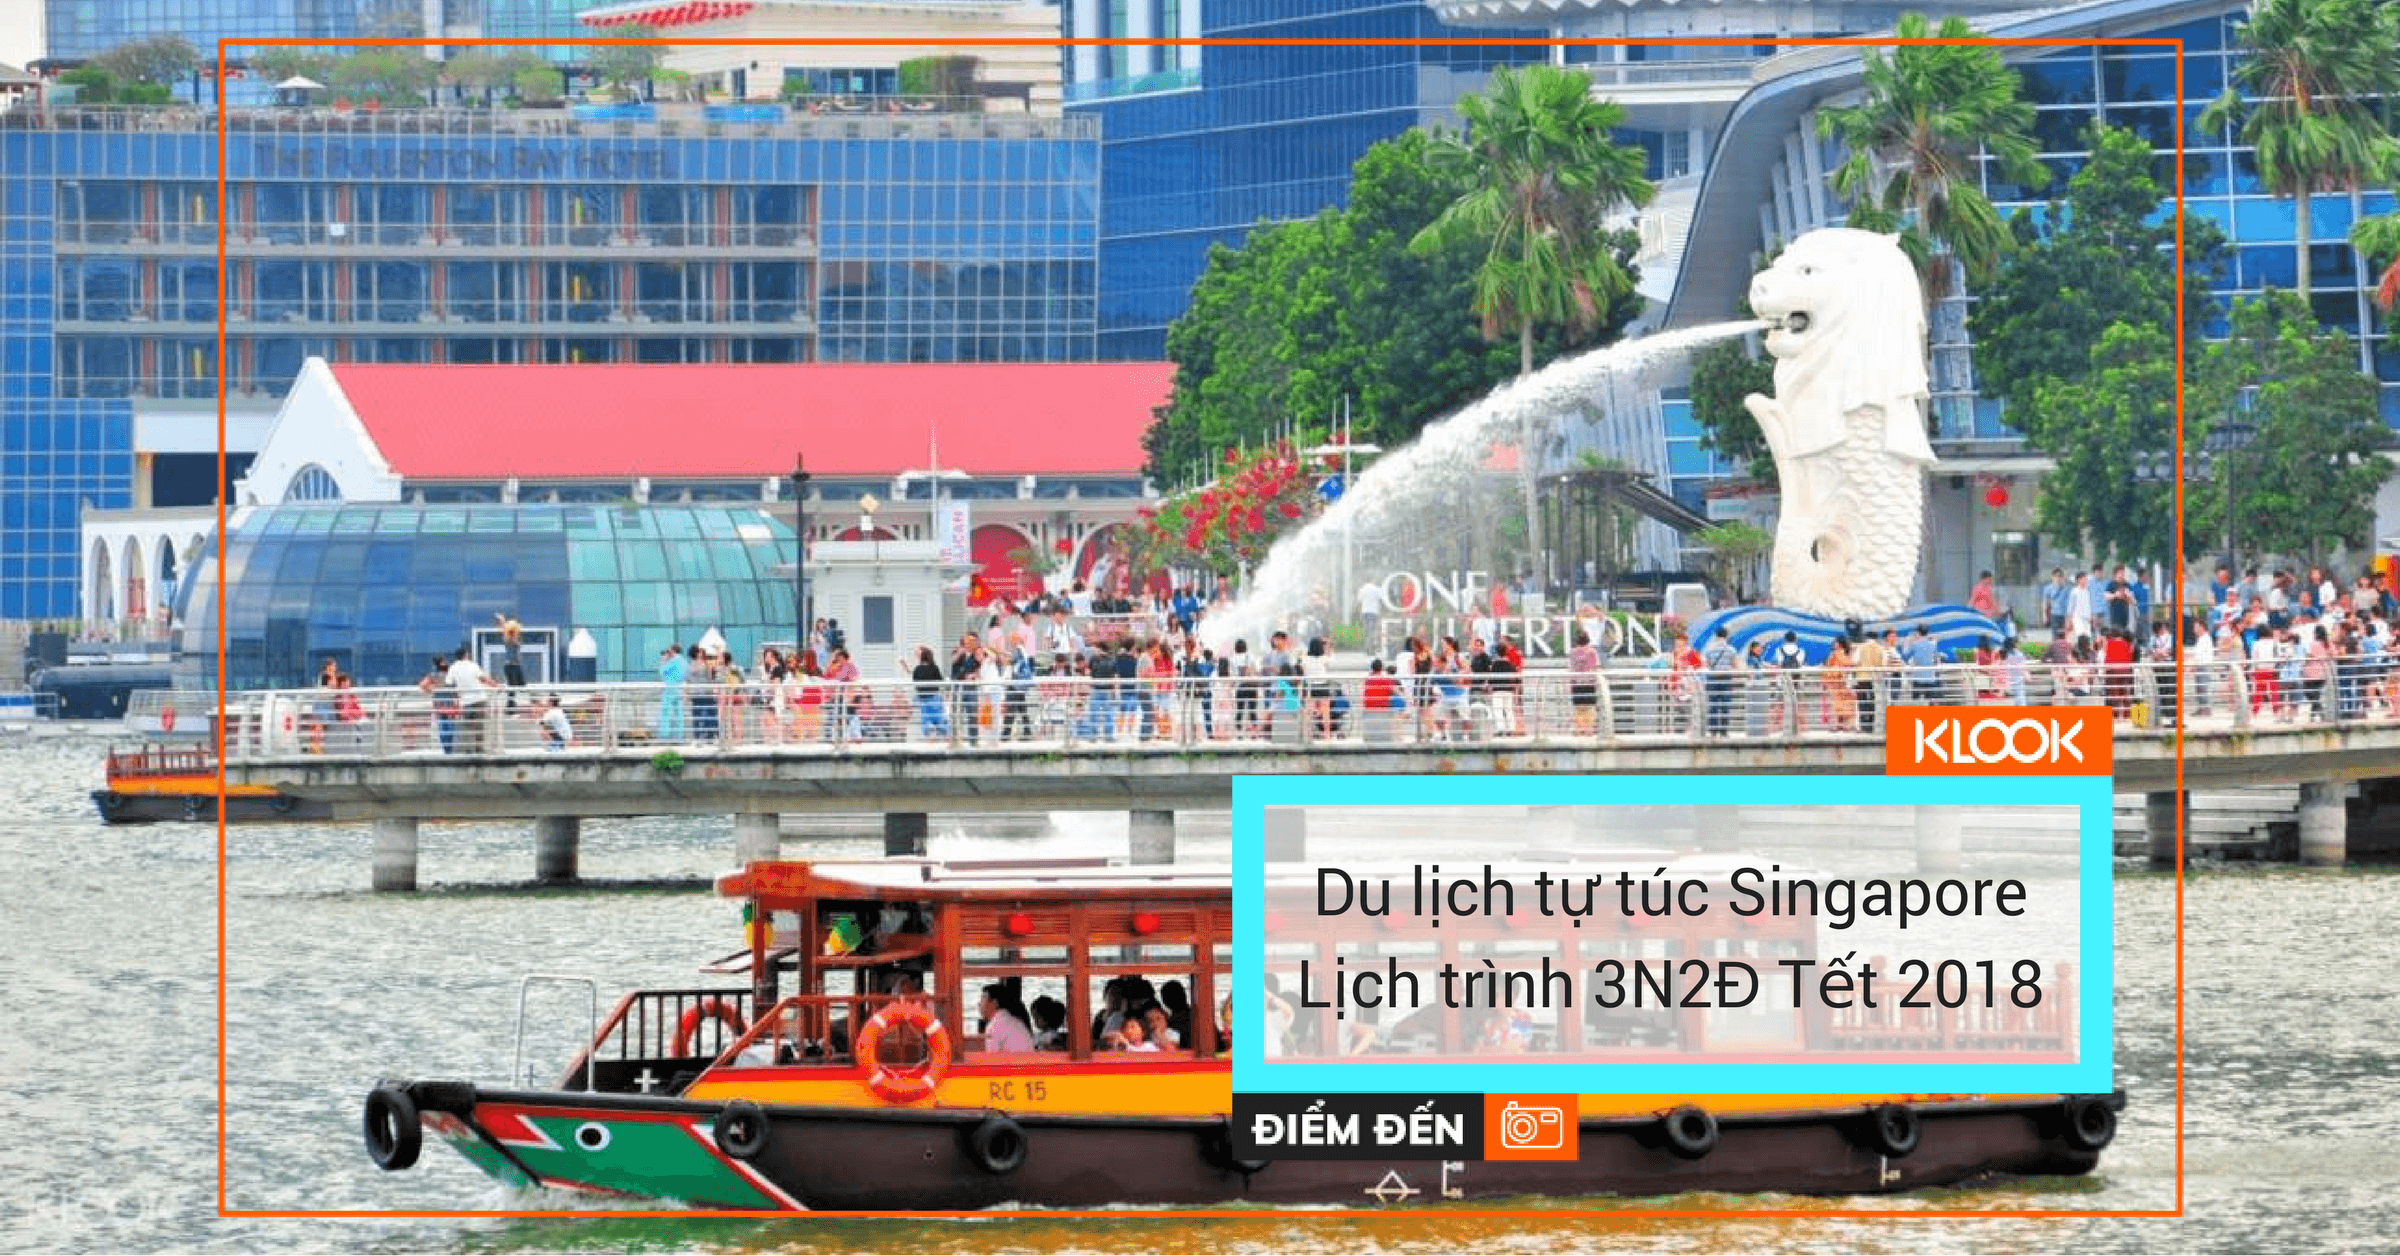 du lich tu tuc singapore tet 2018